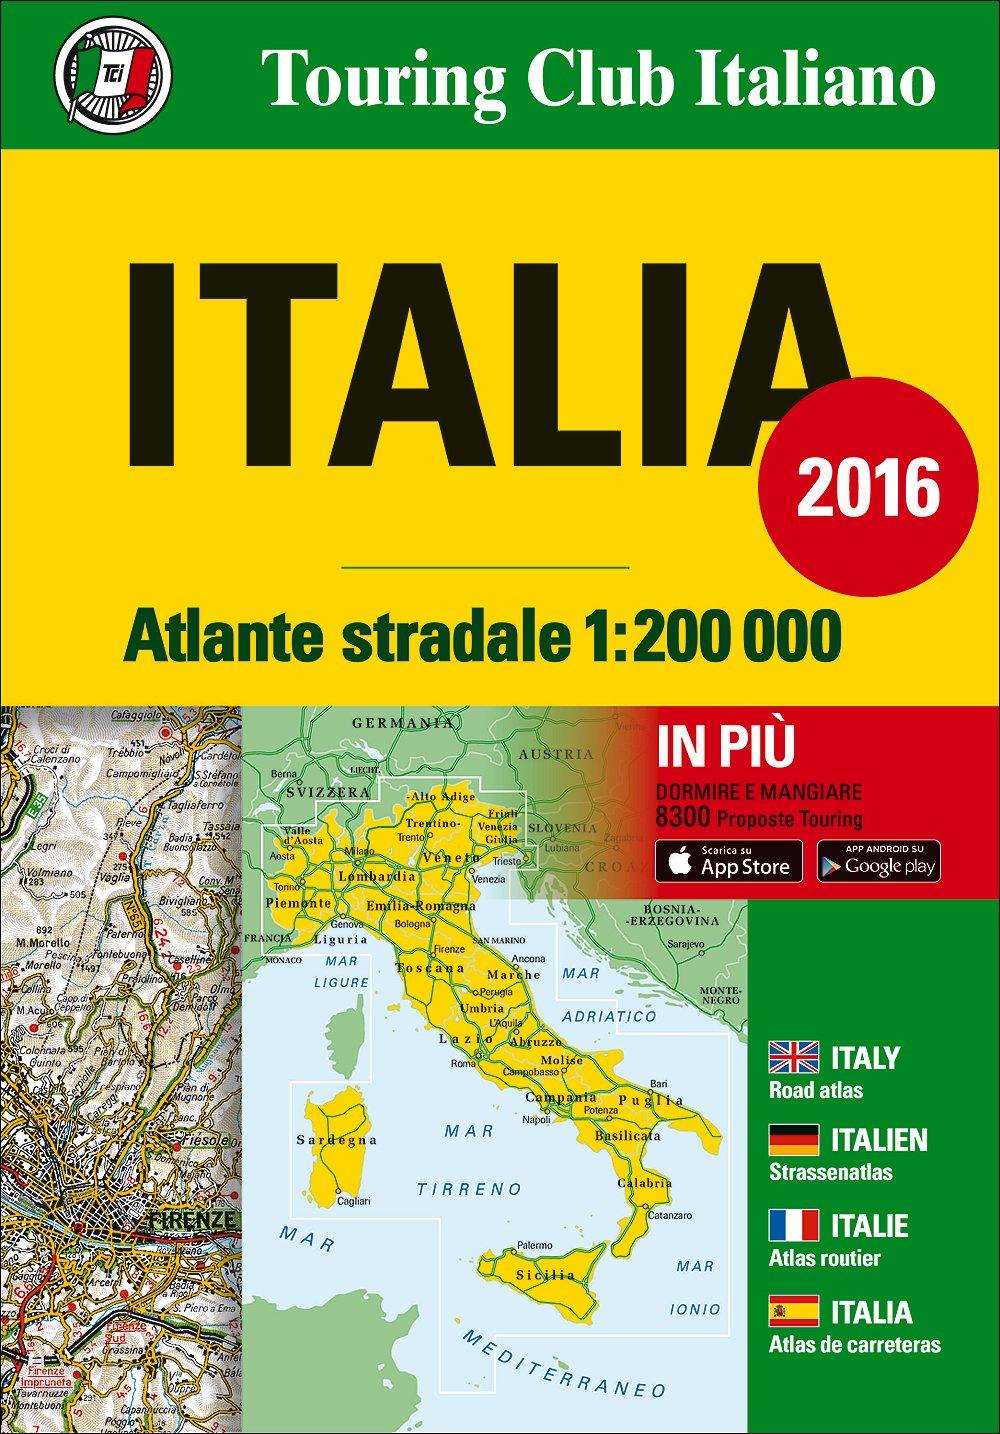 Italy Atlas - Atlante Stradale 2016: TCI.A0